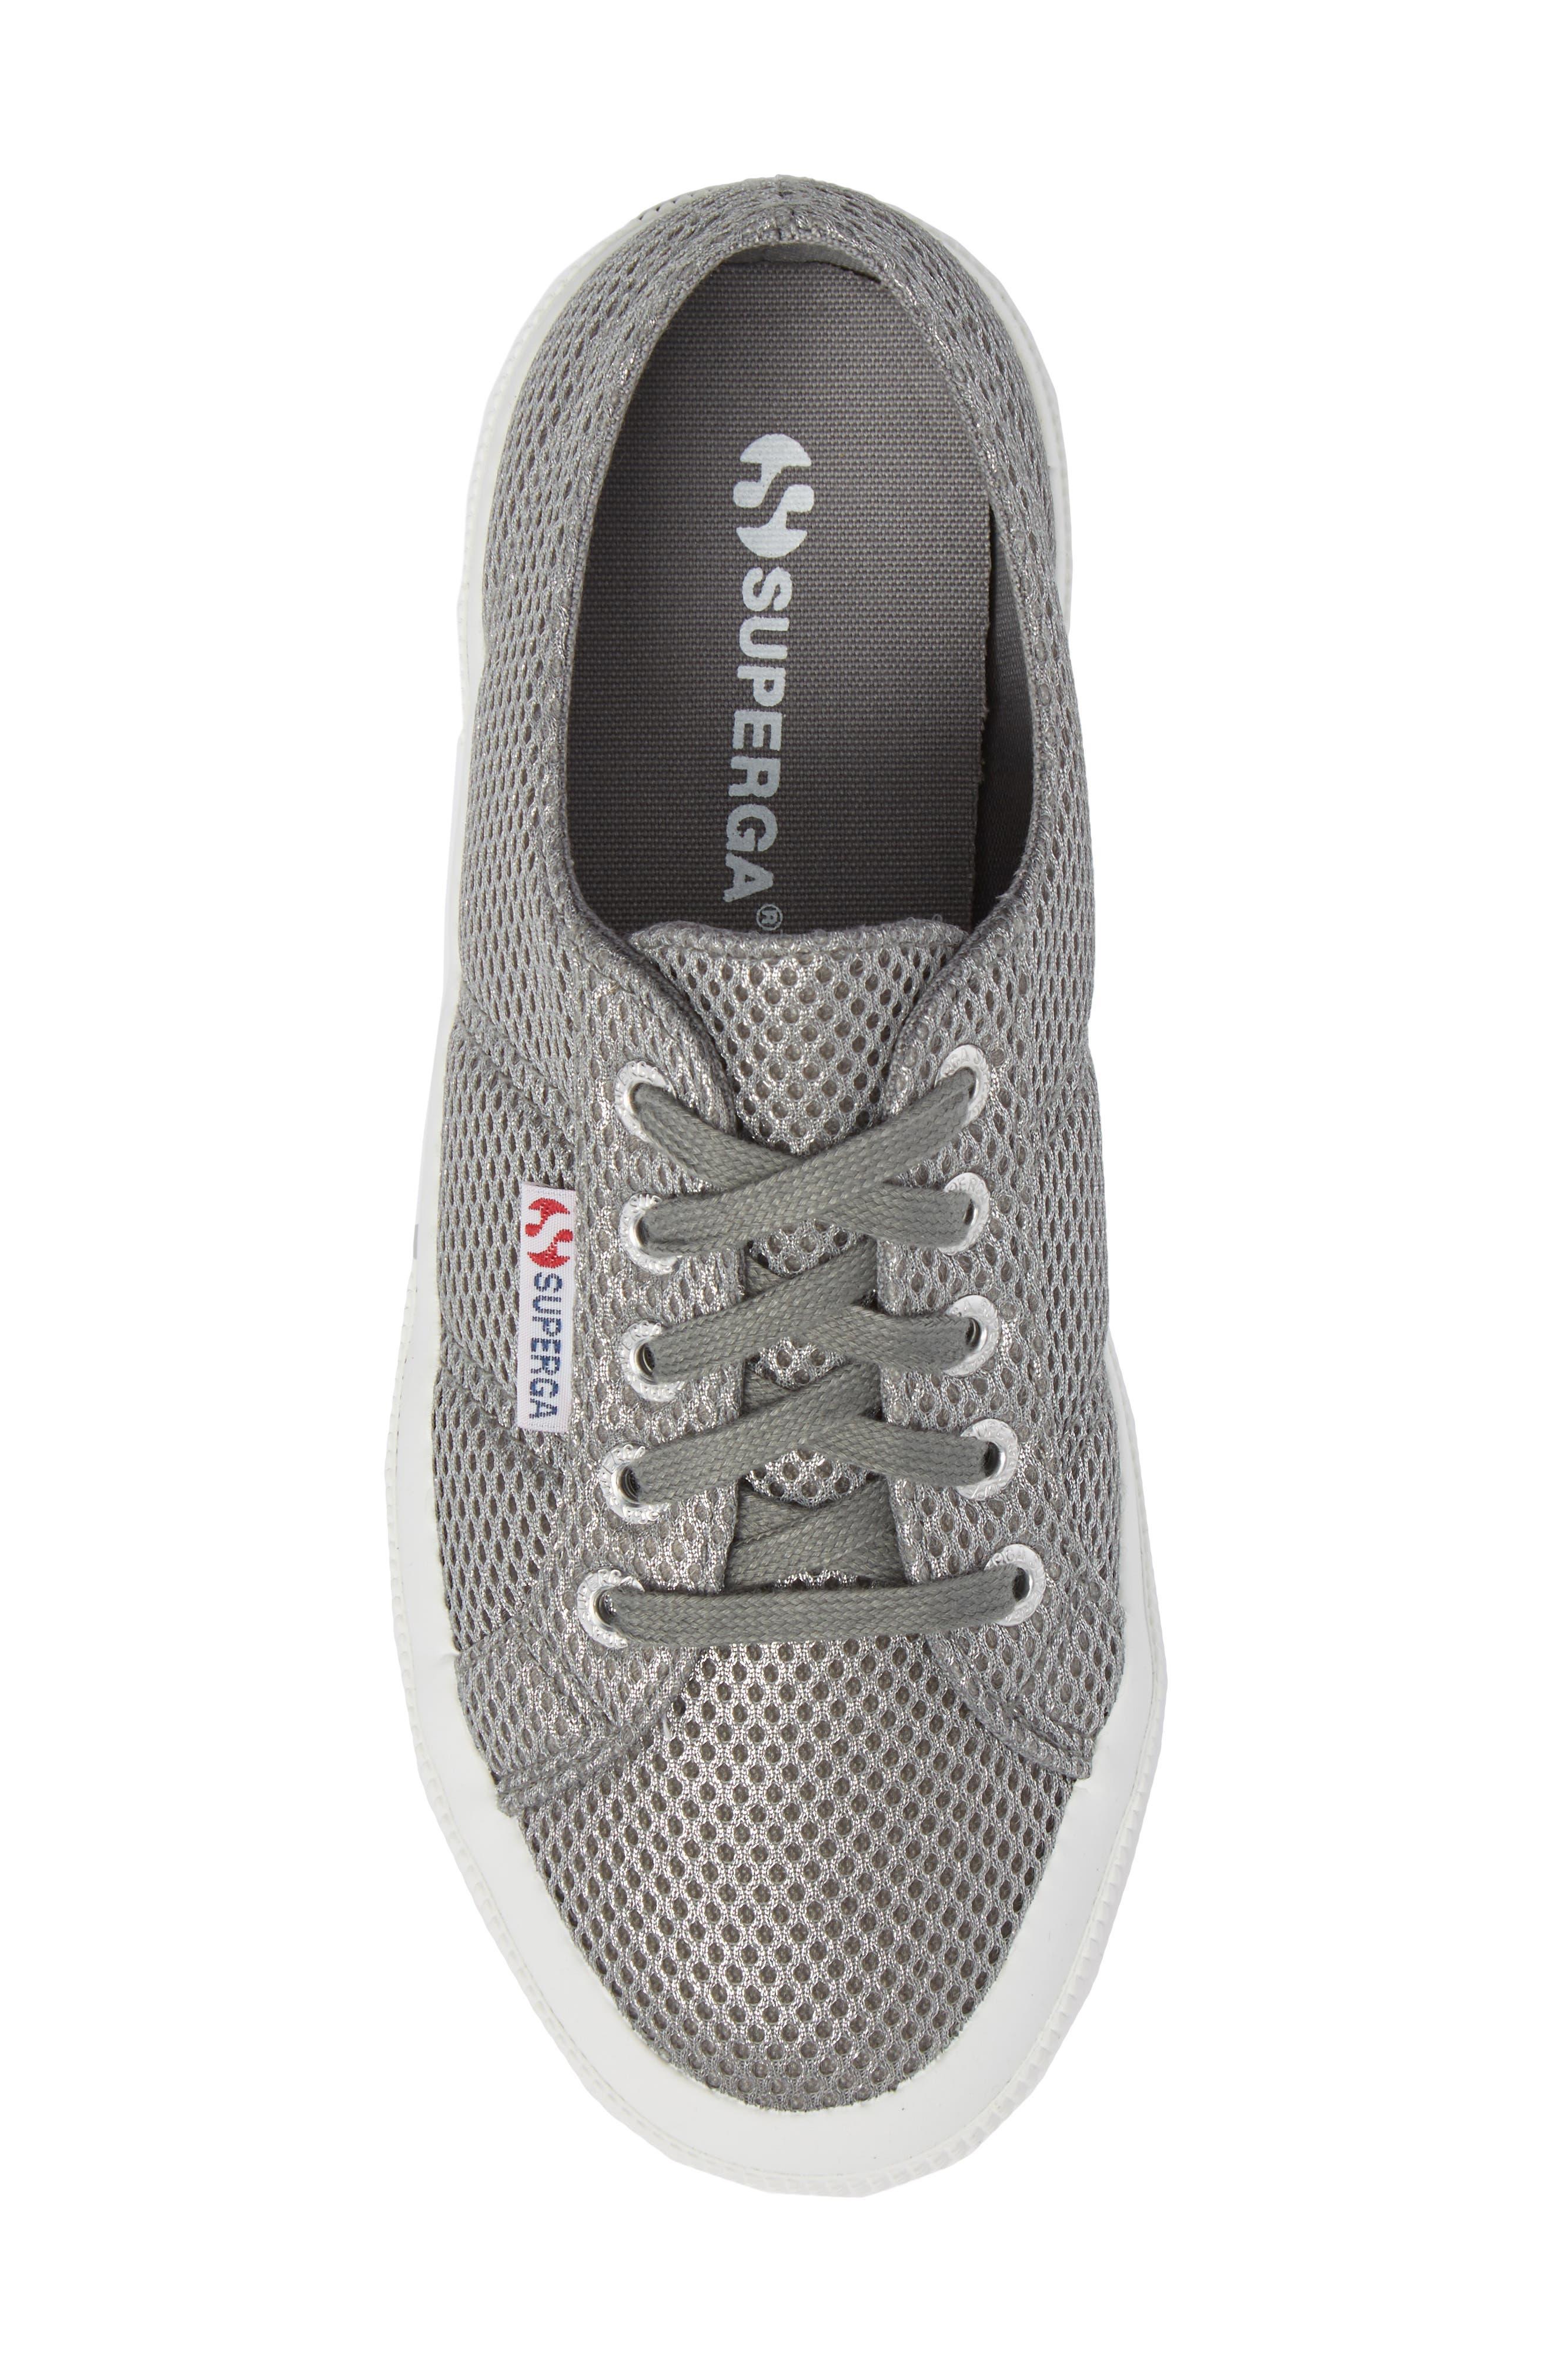 2750 Metallic Sneaker,                             Alternate thumbnail 5, color,                             044